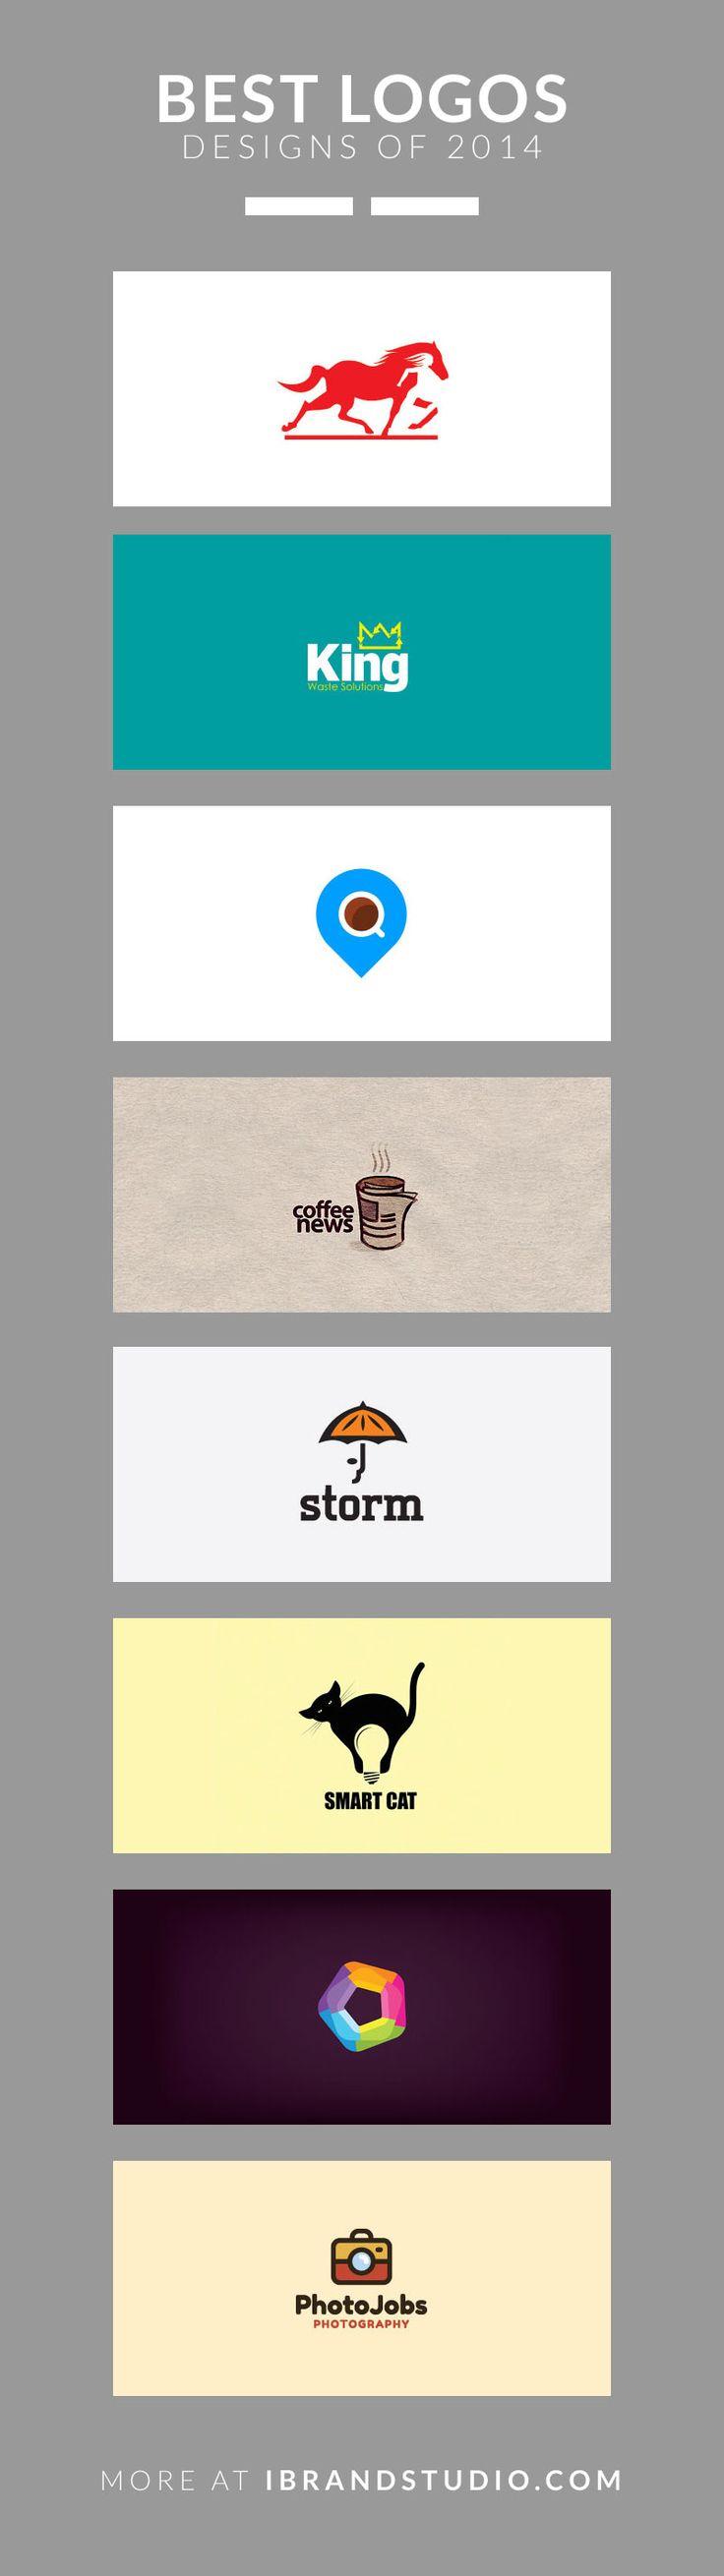 60 Best Logo Designs of 2014 #logos #inspiration